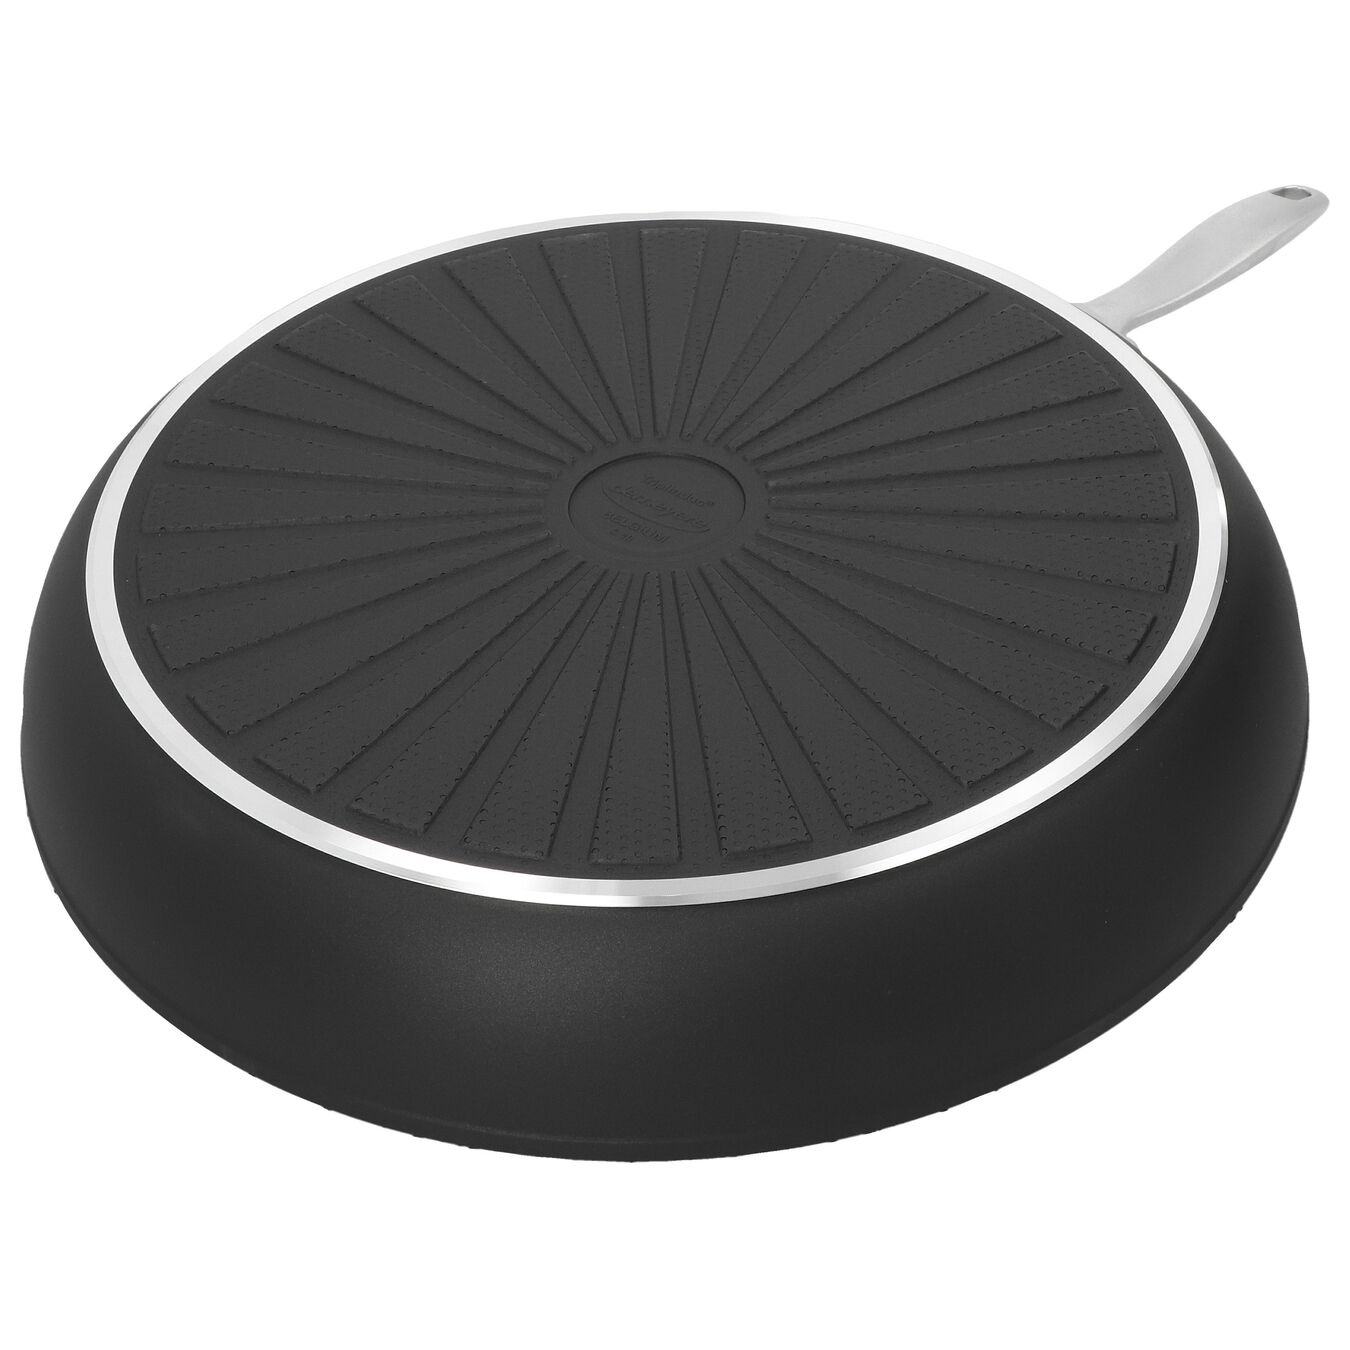 12.5-inch, aluminium, Non-stick, Frying pan,,large 2